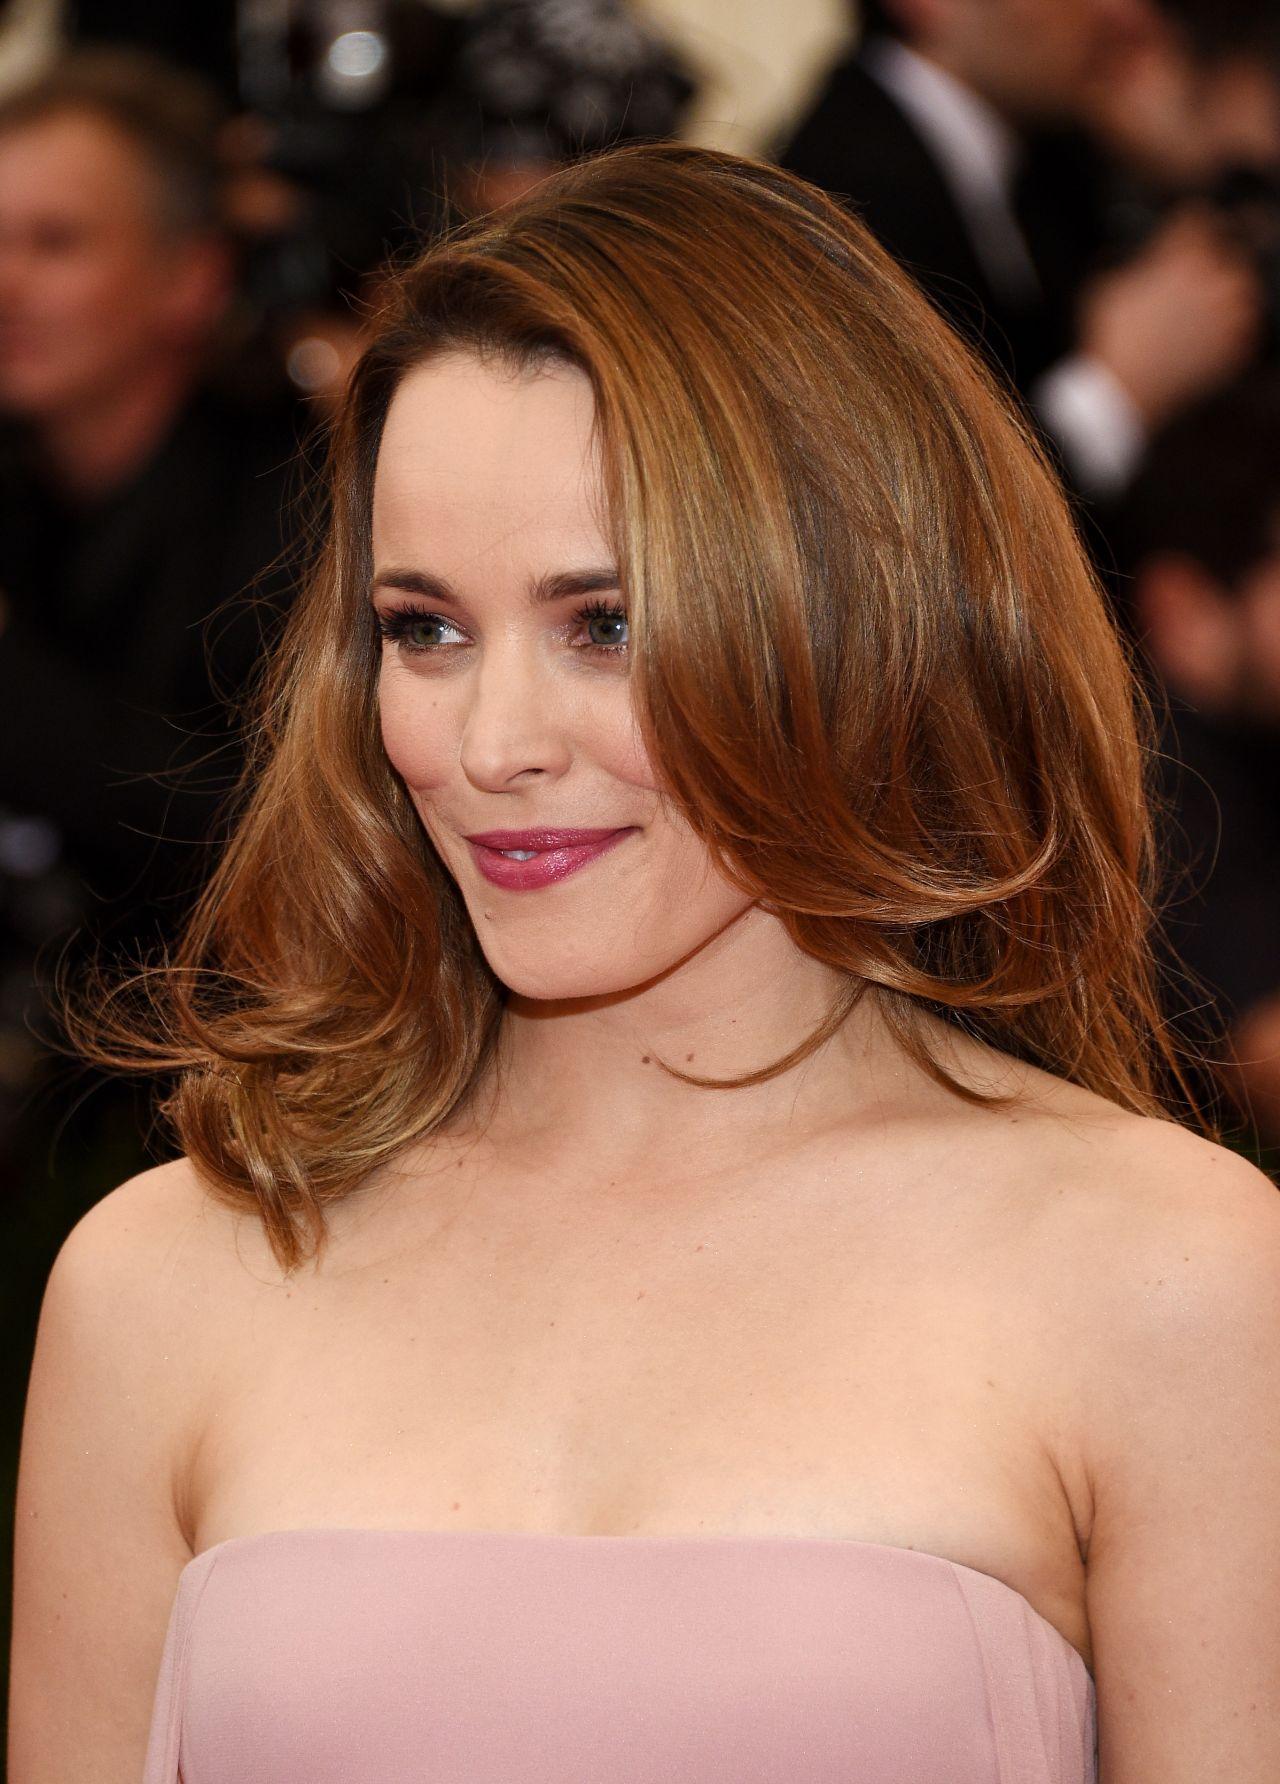 Rachel Mcadams In Ralph Lauren To The Met Gala 2014 Ii Rachel Mcadams Hair Hair Evolution Hair Color